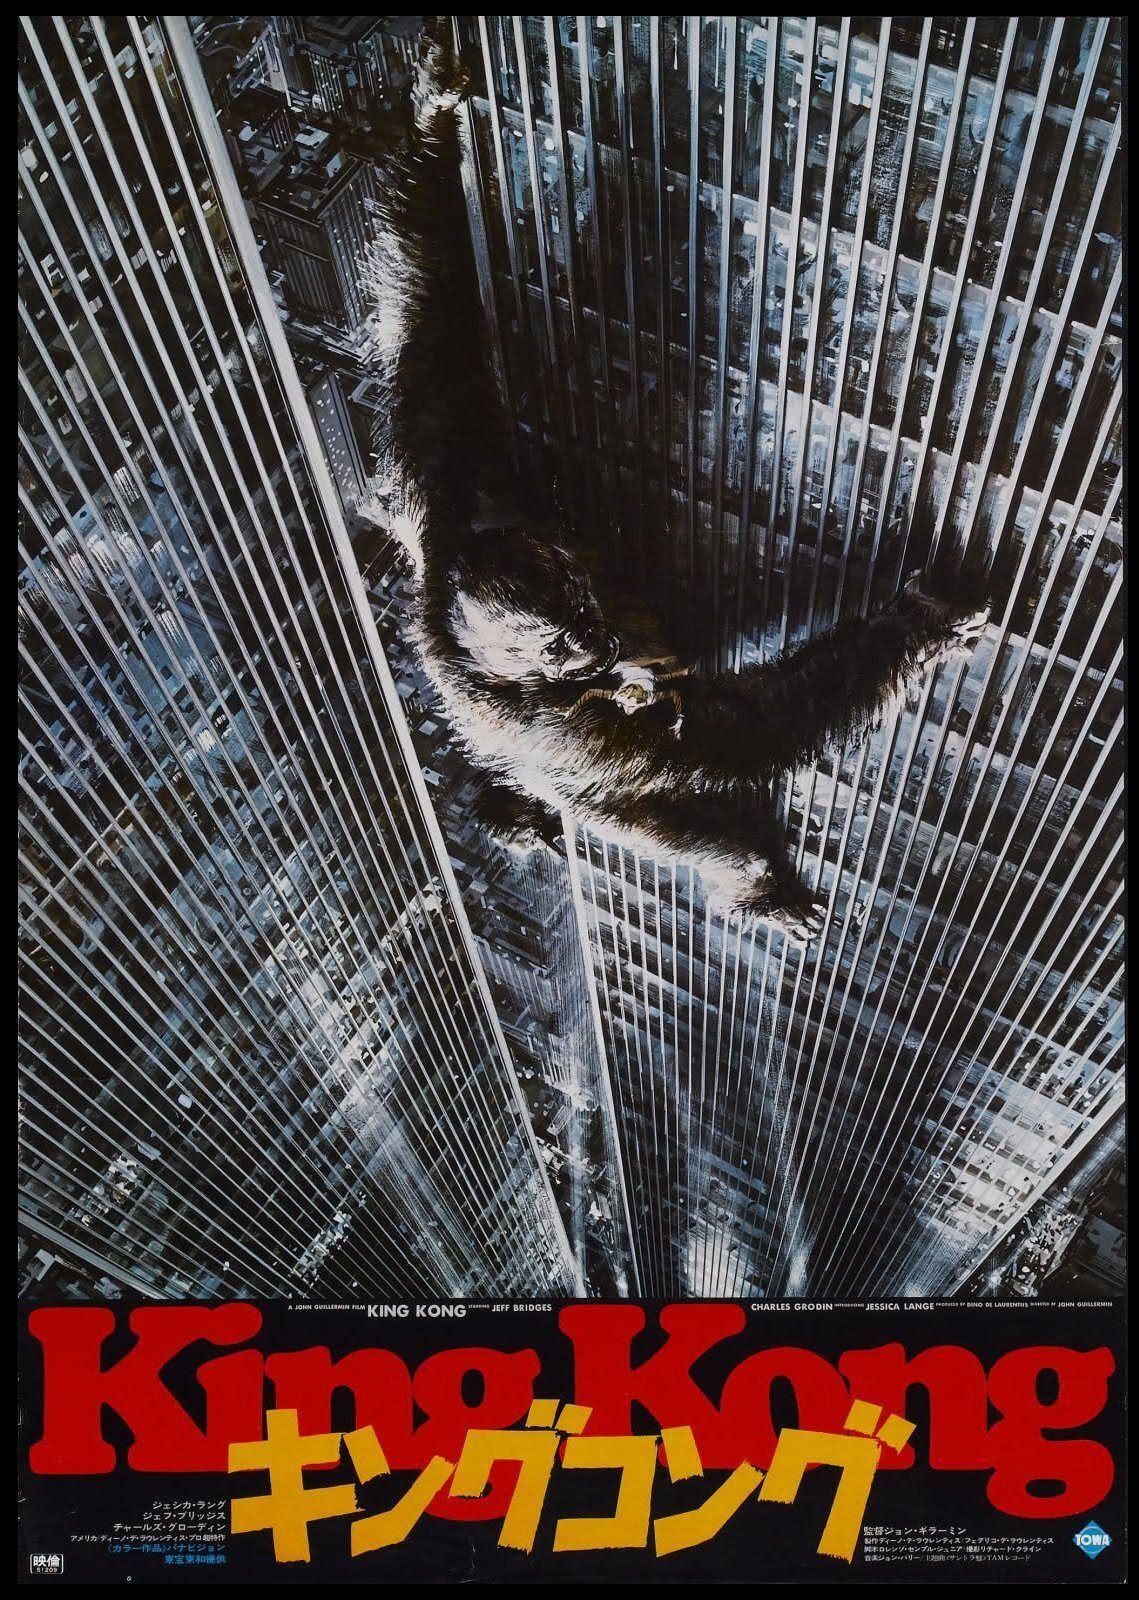 King Kong Movie Poster Artwork John Berkey 70s 80s